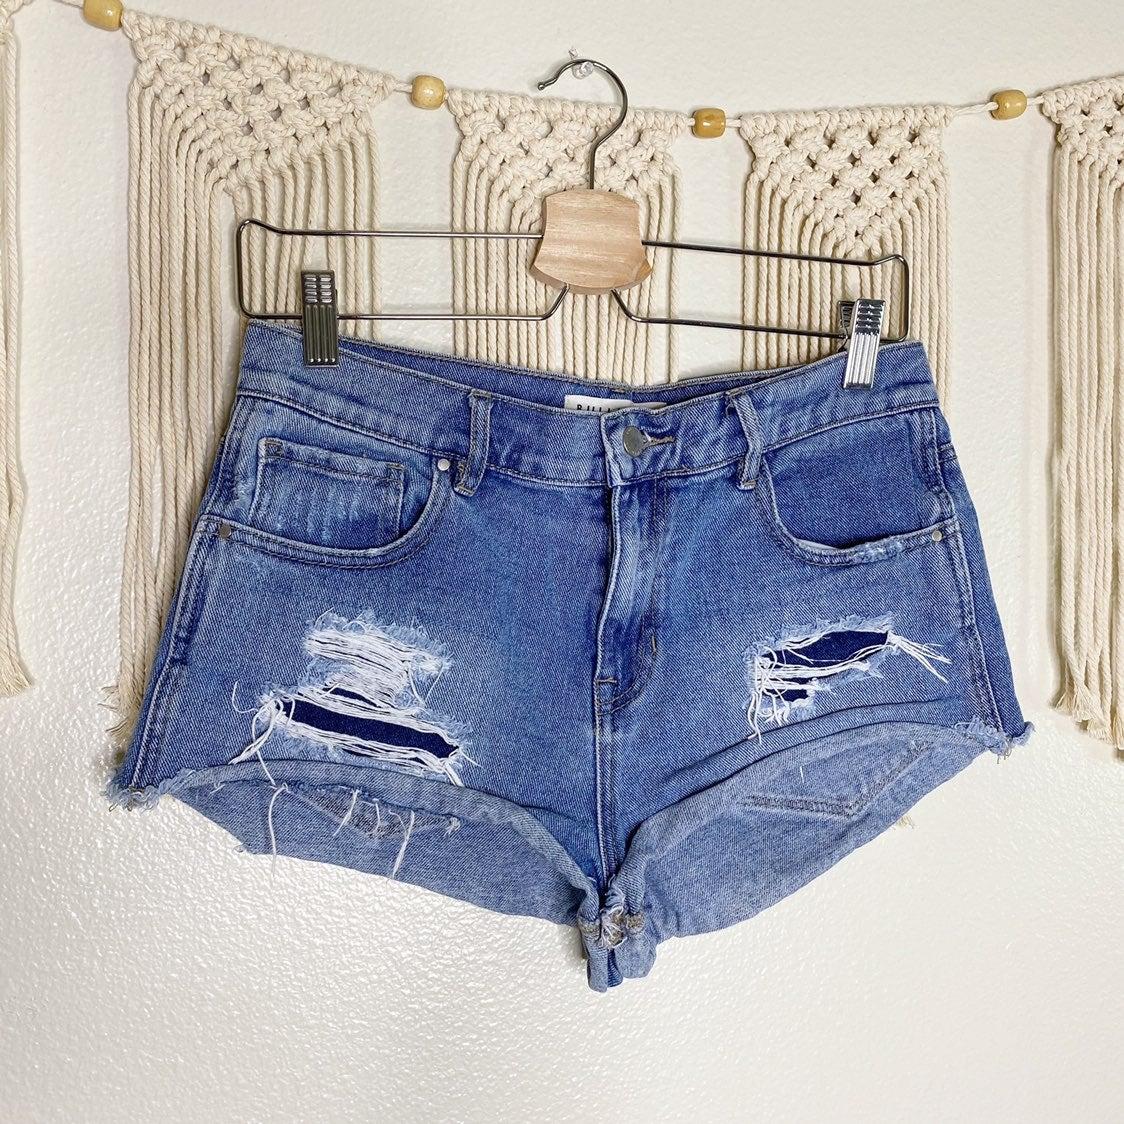 BULLHEAD high-rise distressed shorts 28